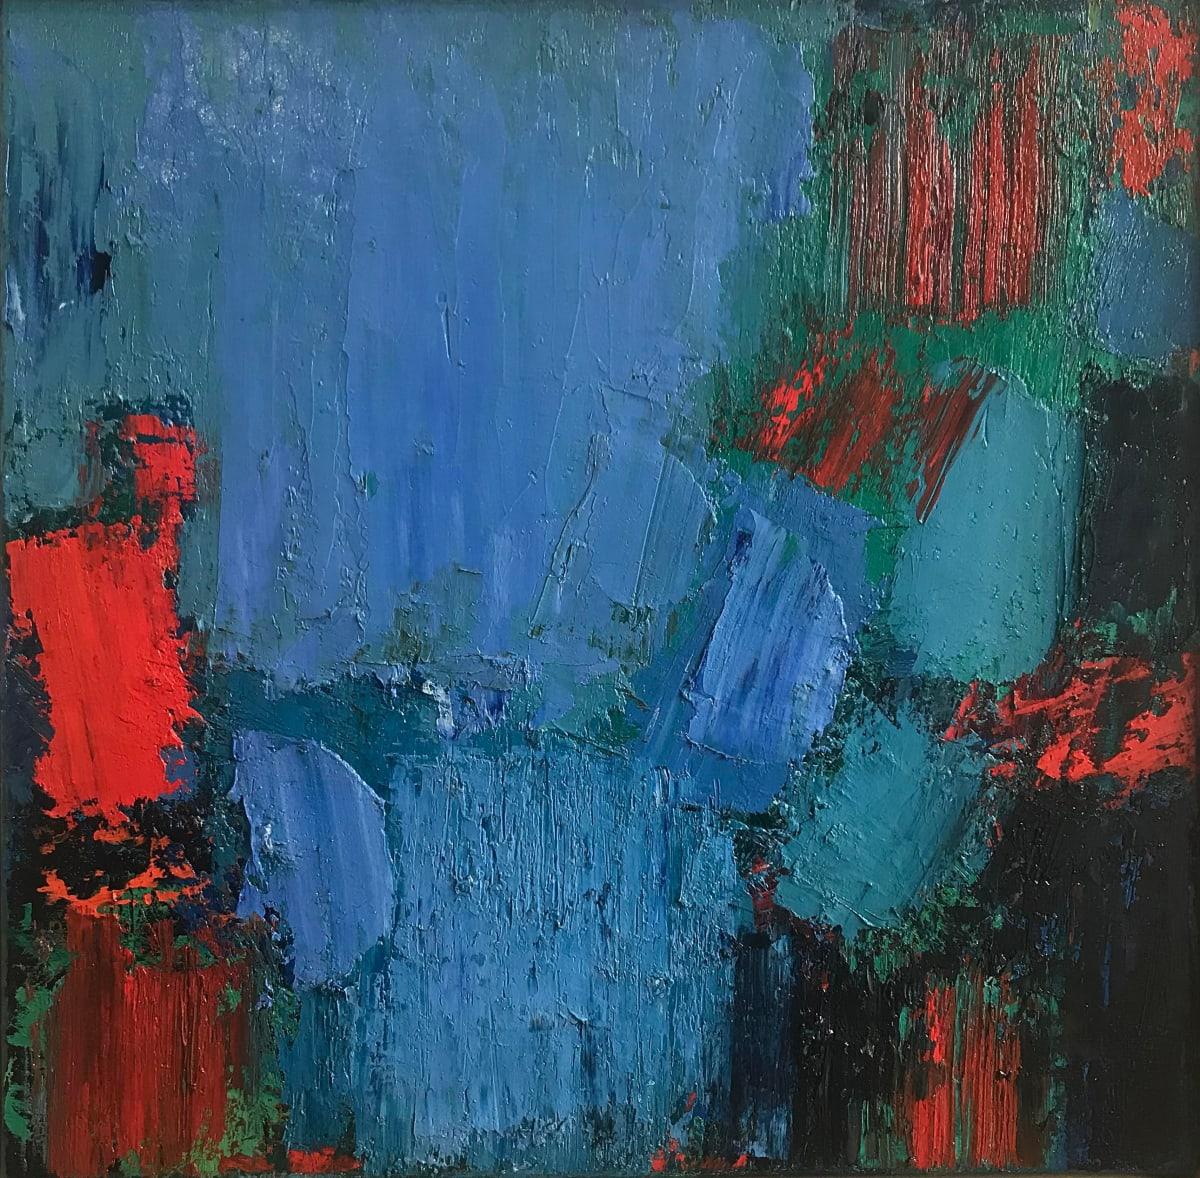 Martyn Brewster, Seaborne Series, No. 7, 1994